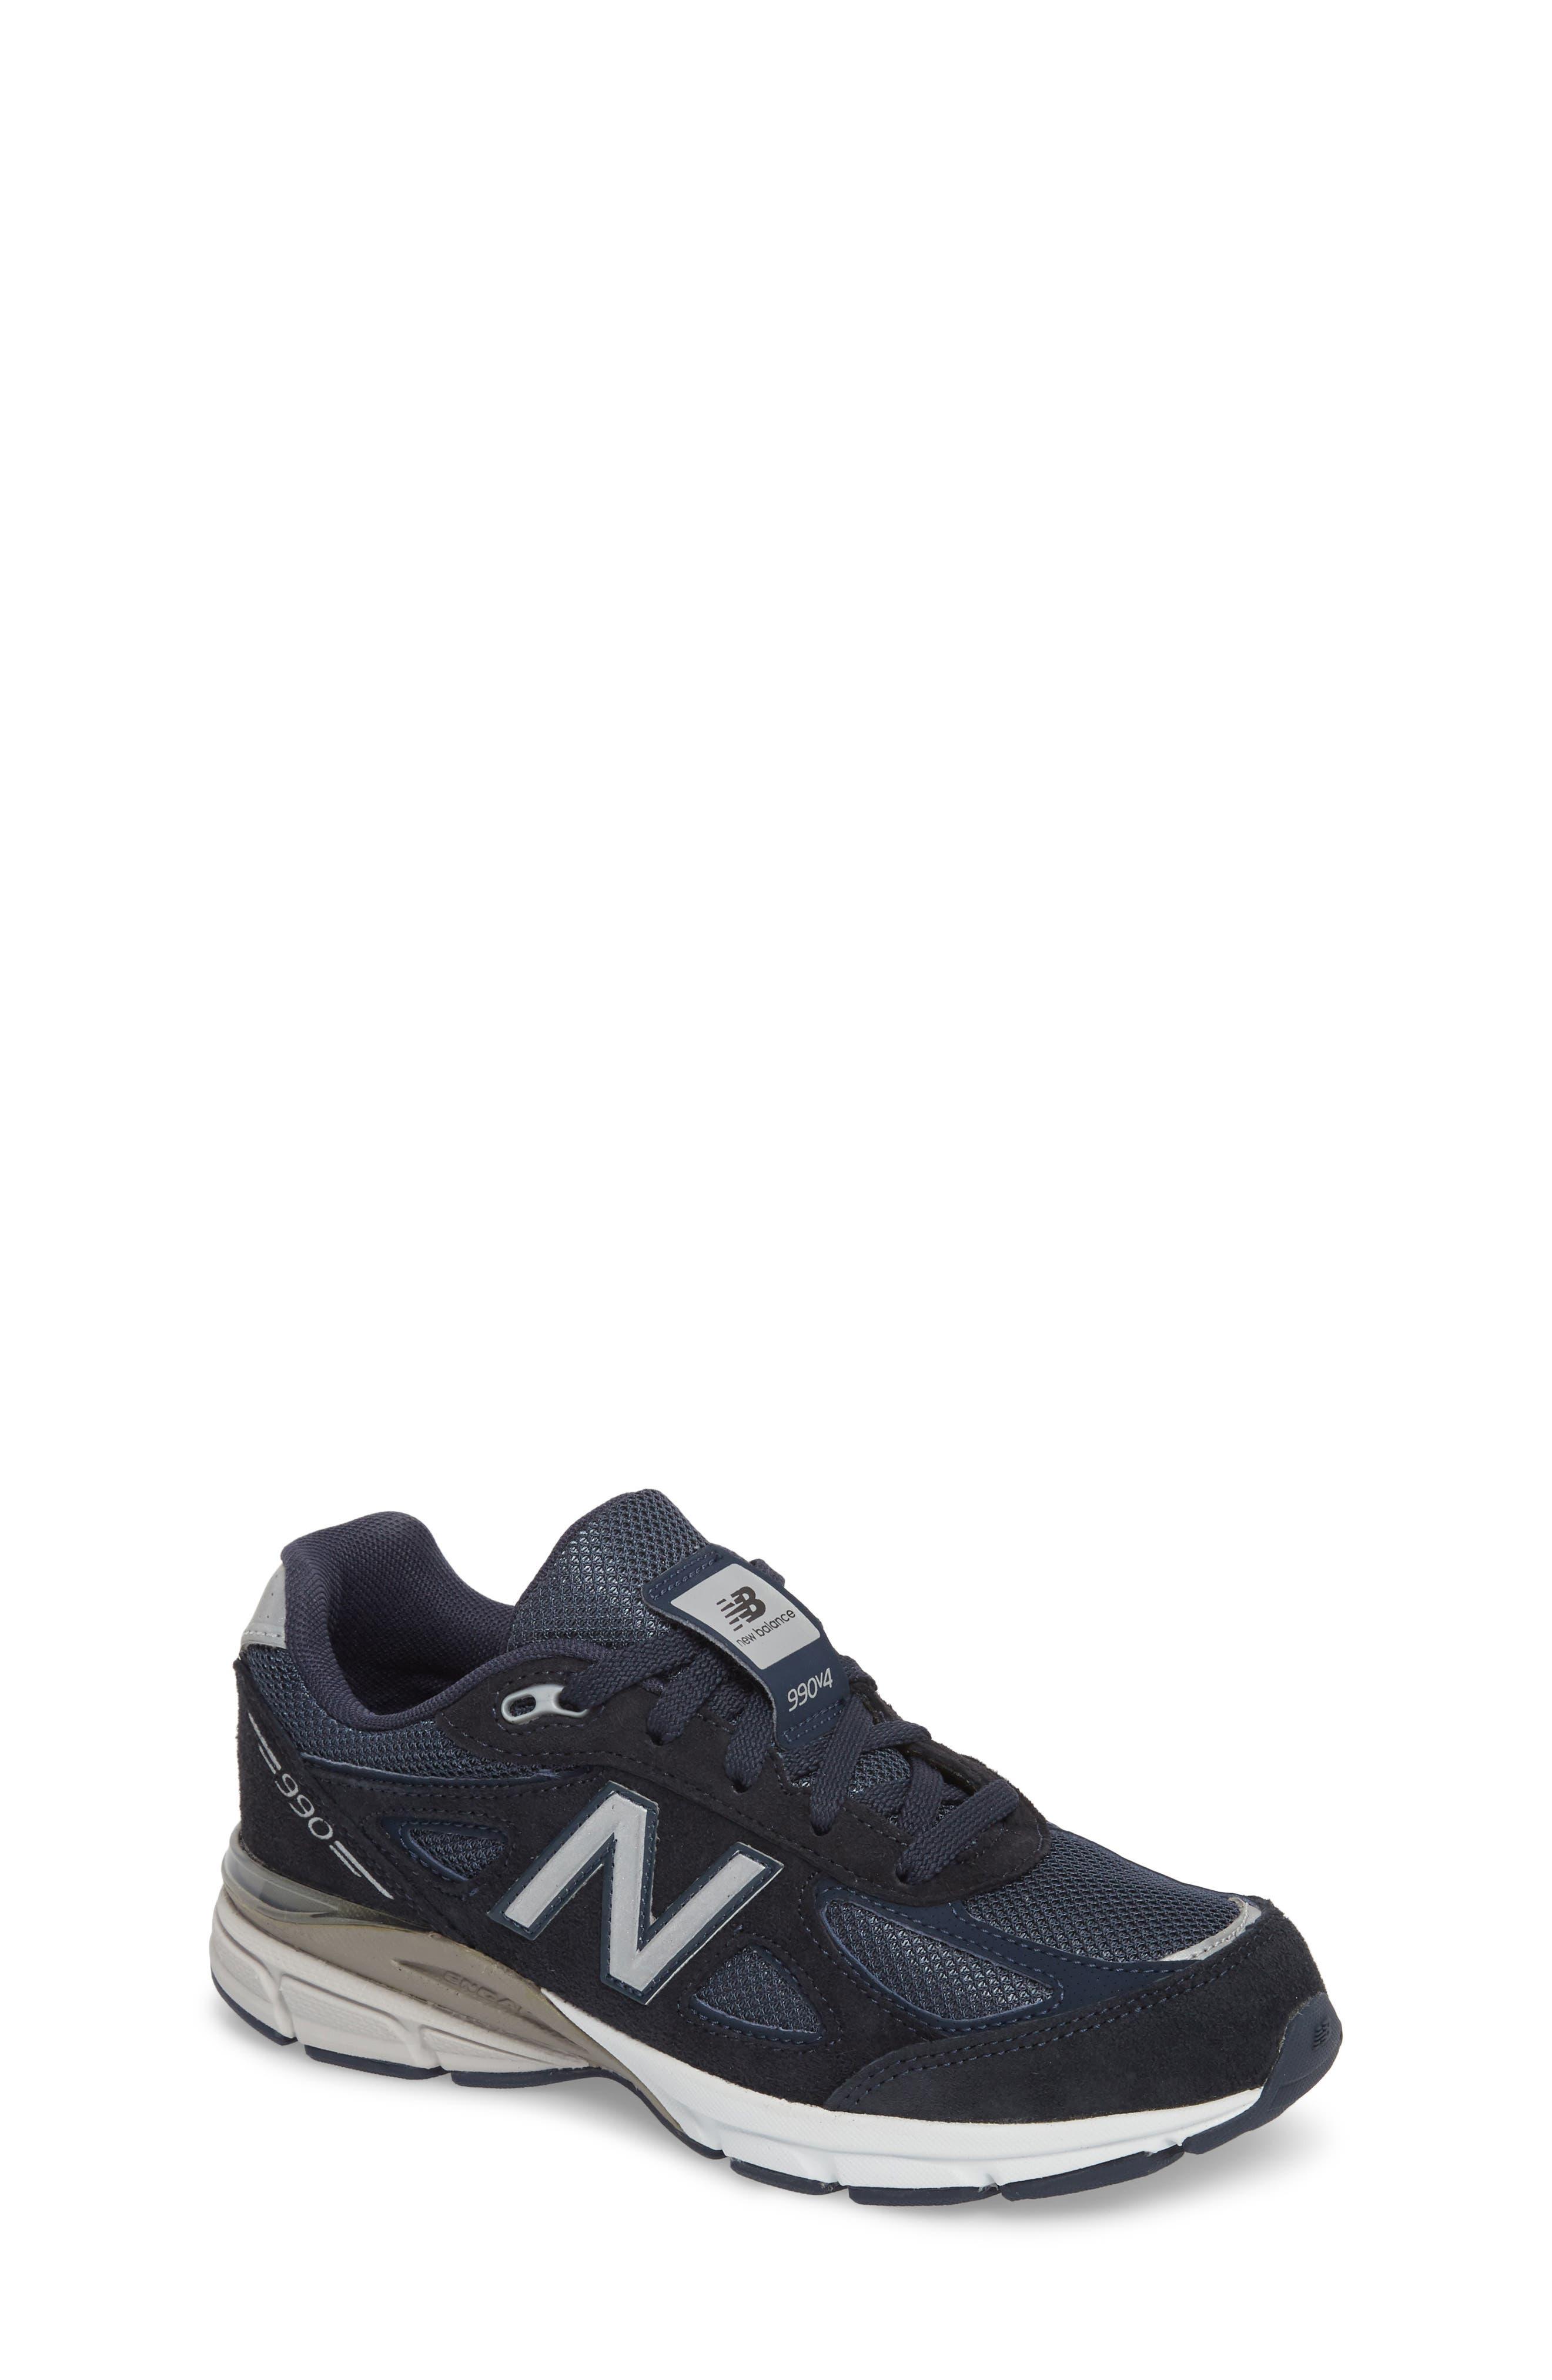 990v4 Sneaker,                             Main thumbnail 1, color,